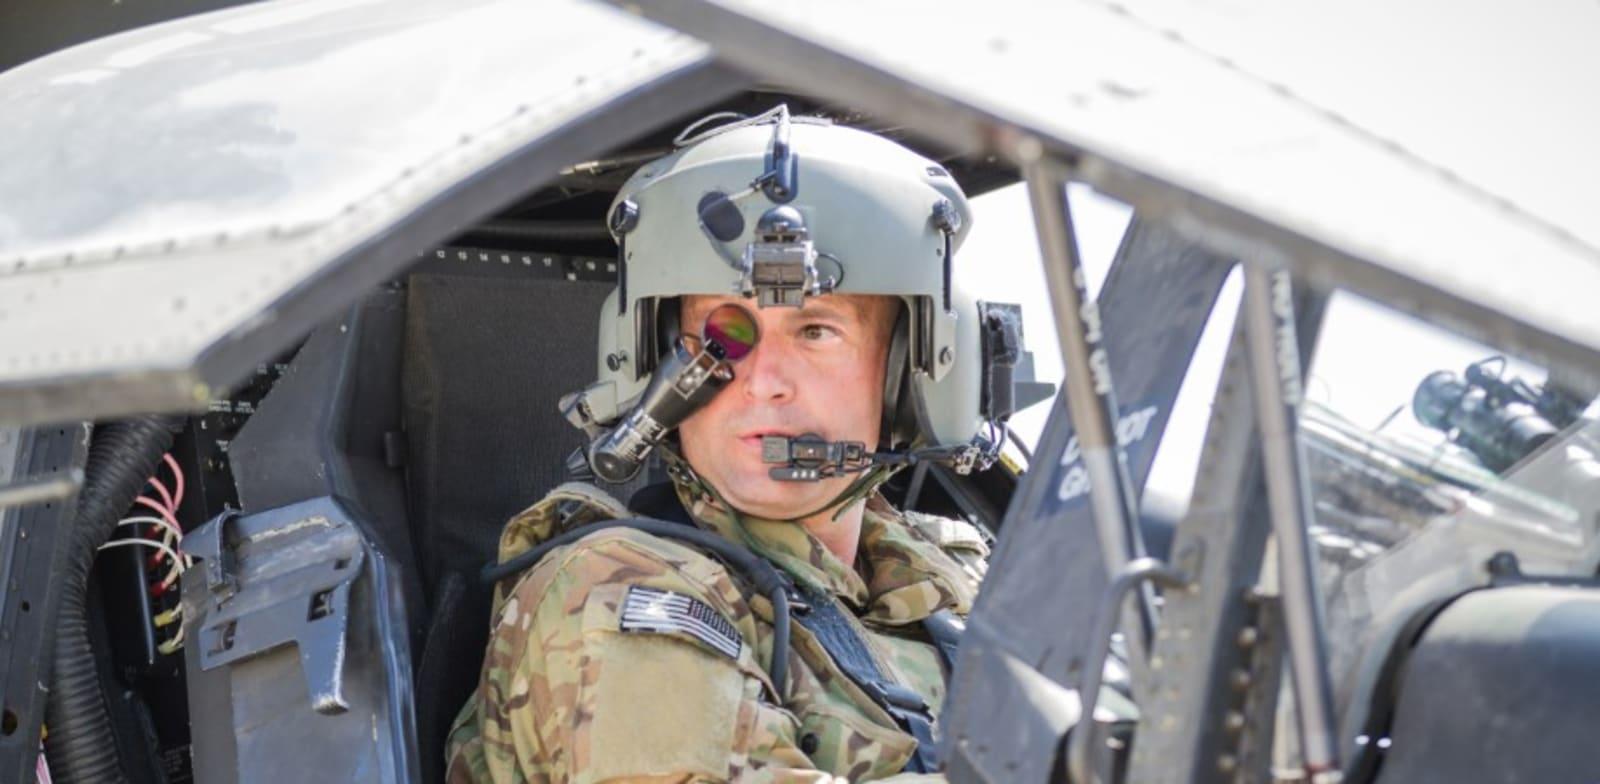 Apache pilot's helmet Photo: Elbit Systems